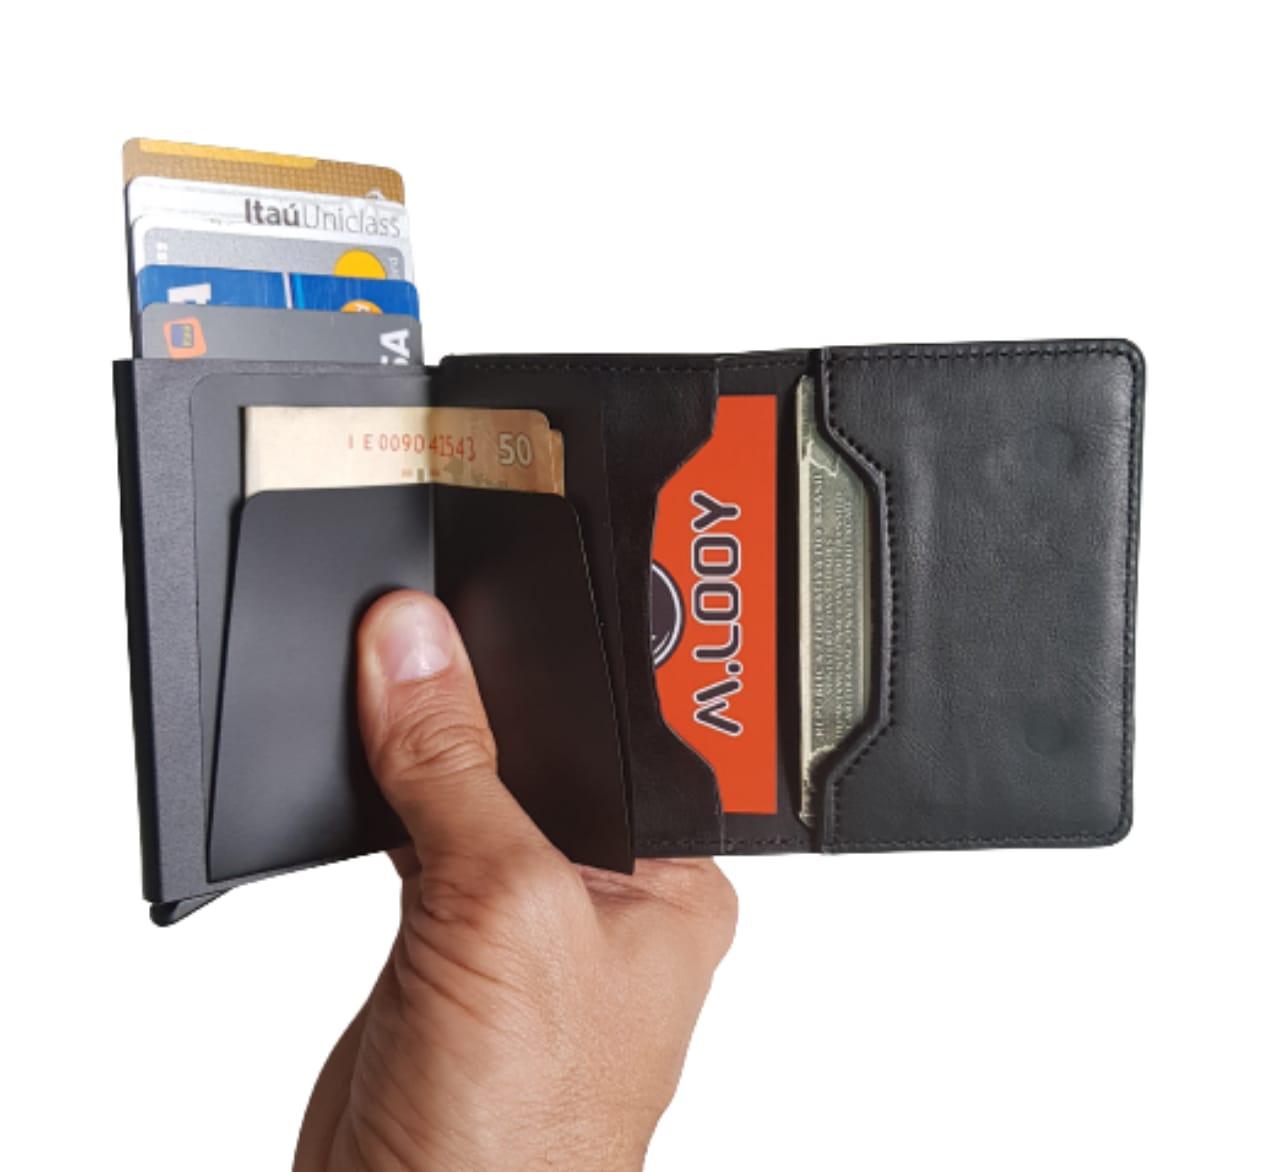 Carteira Minimalista Antifurto Automática Pop Up Com Porta Cédulas e Cartões Anti RFID Blocking